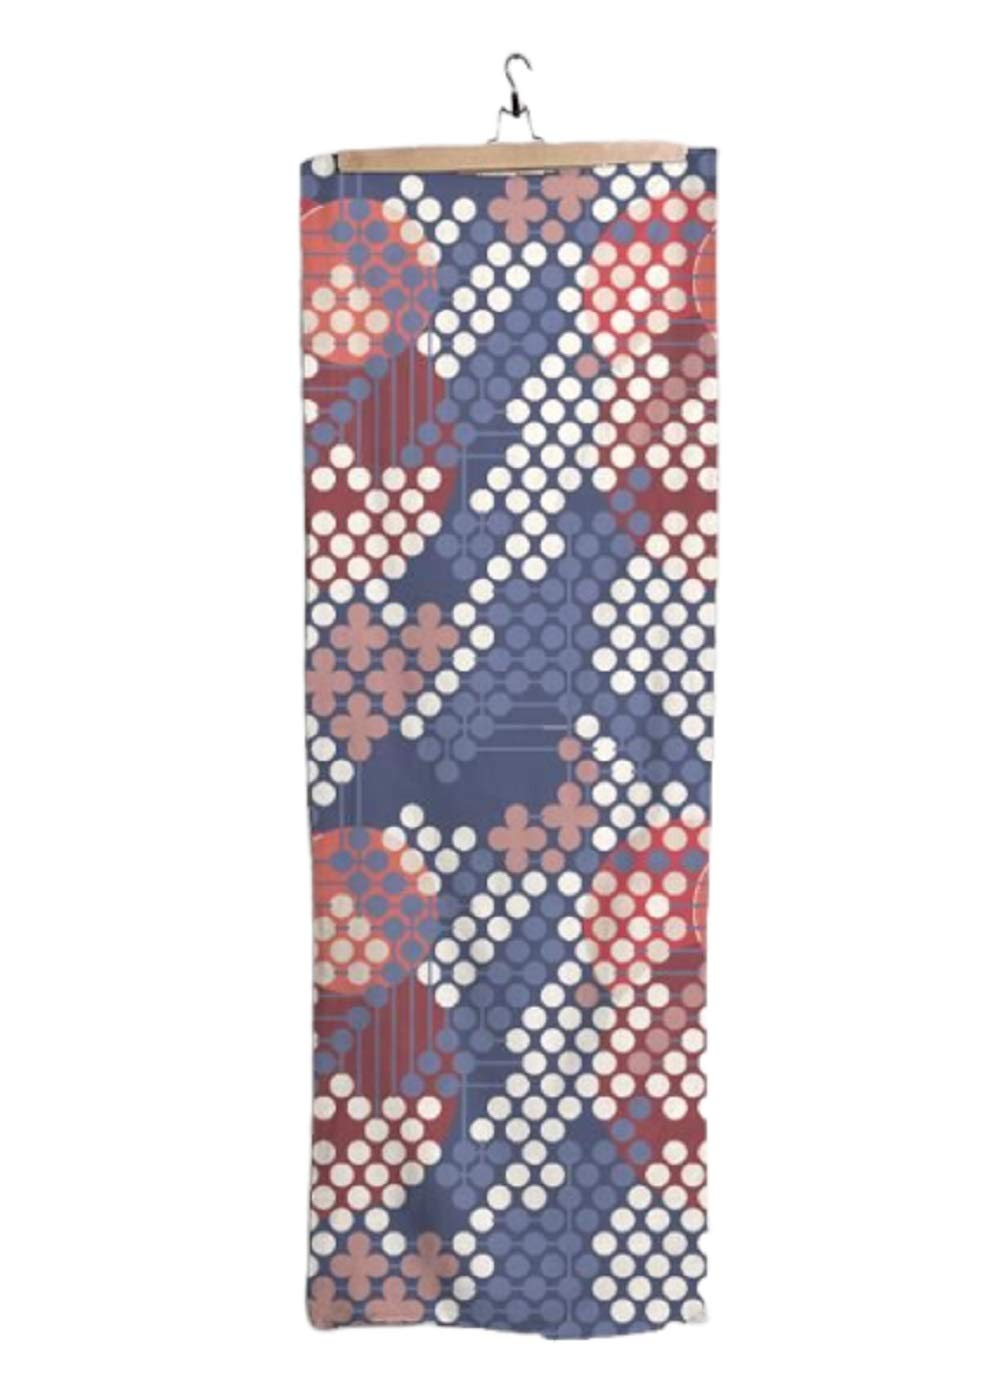 VIDA Crimson & Blue Modal Scarf (1955 Textile Design - 105) 28'' × 78'' | Original Artwork by Frank Lloyd Wright